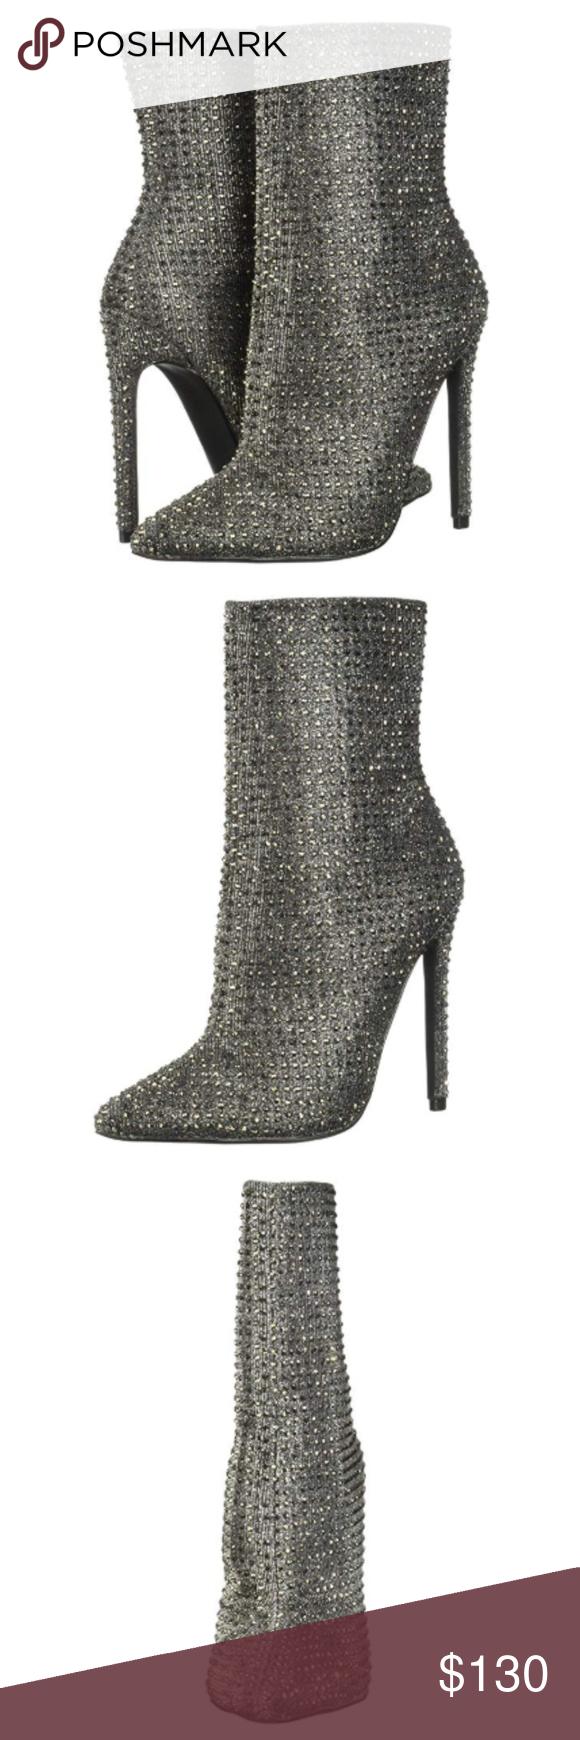 Apariencia Centro de la ciudad lamentar  Steve Madden Wifey Ankle Rhinestone Boots SIze 8 | Steve madden, Clothes  design, Steve madden shoes heels